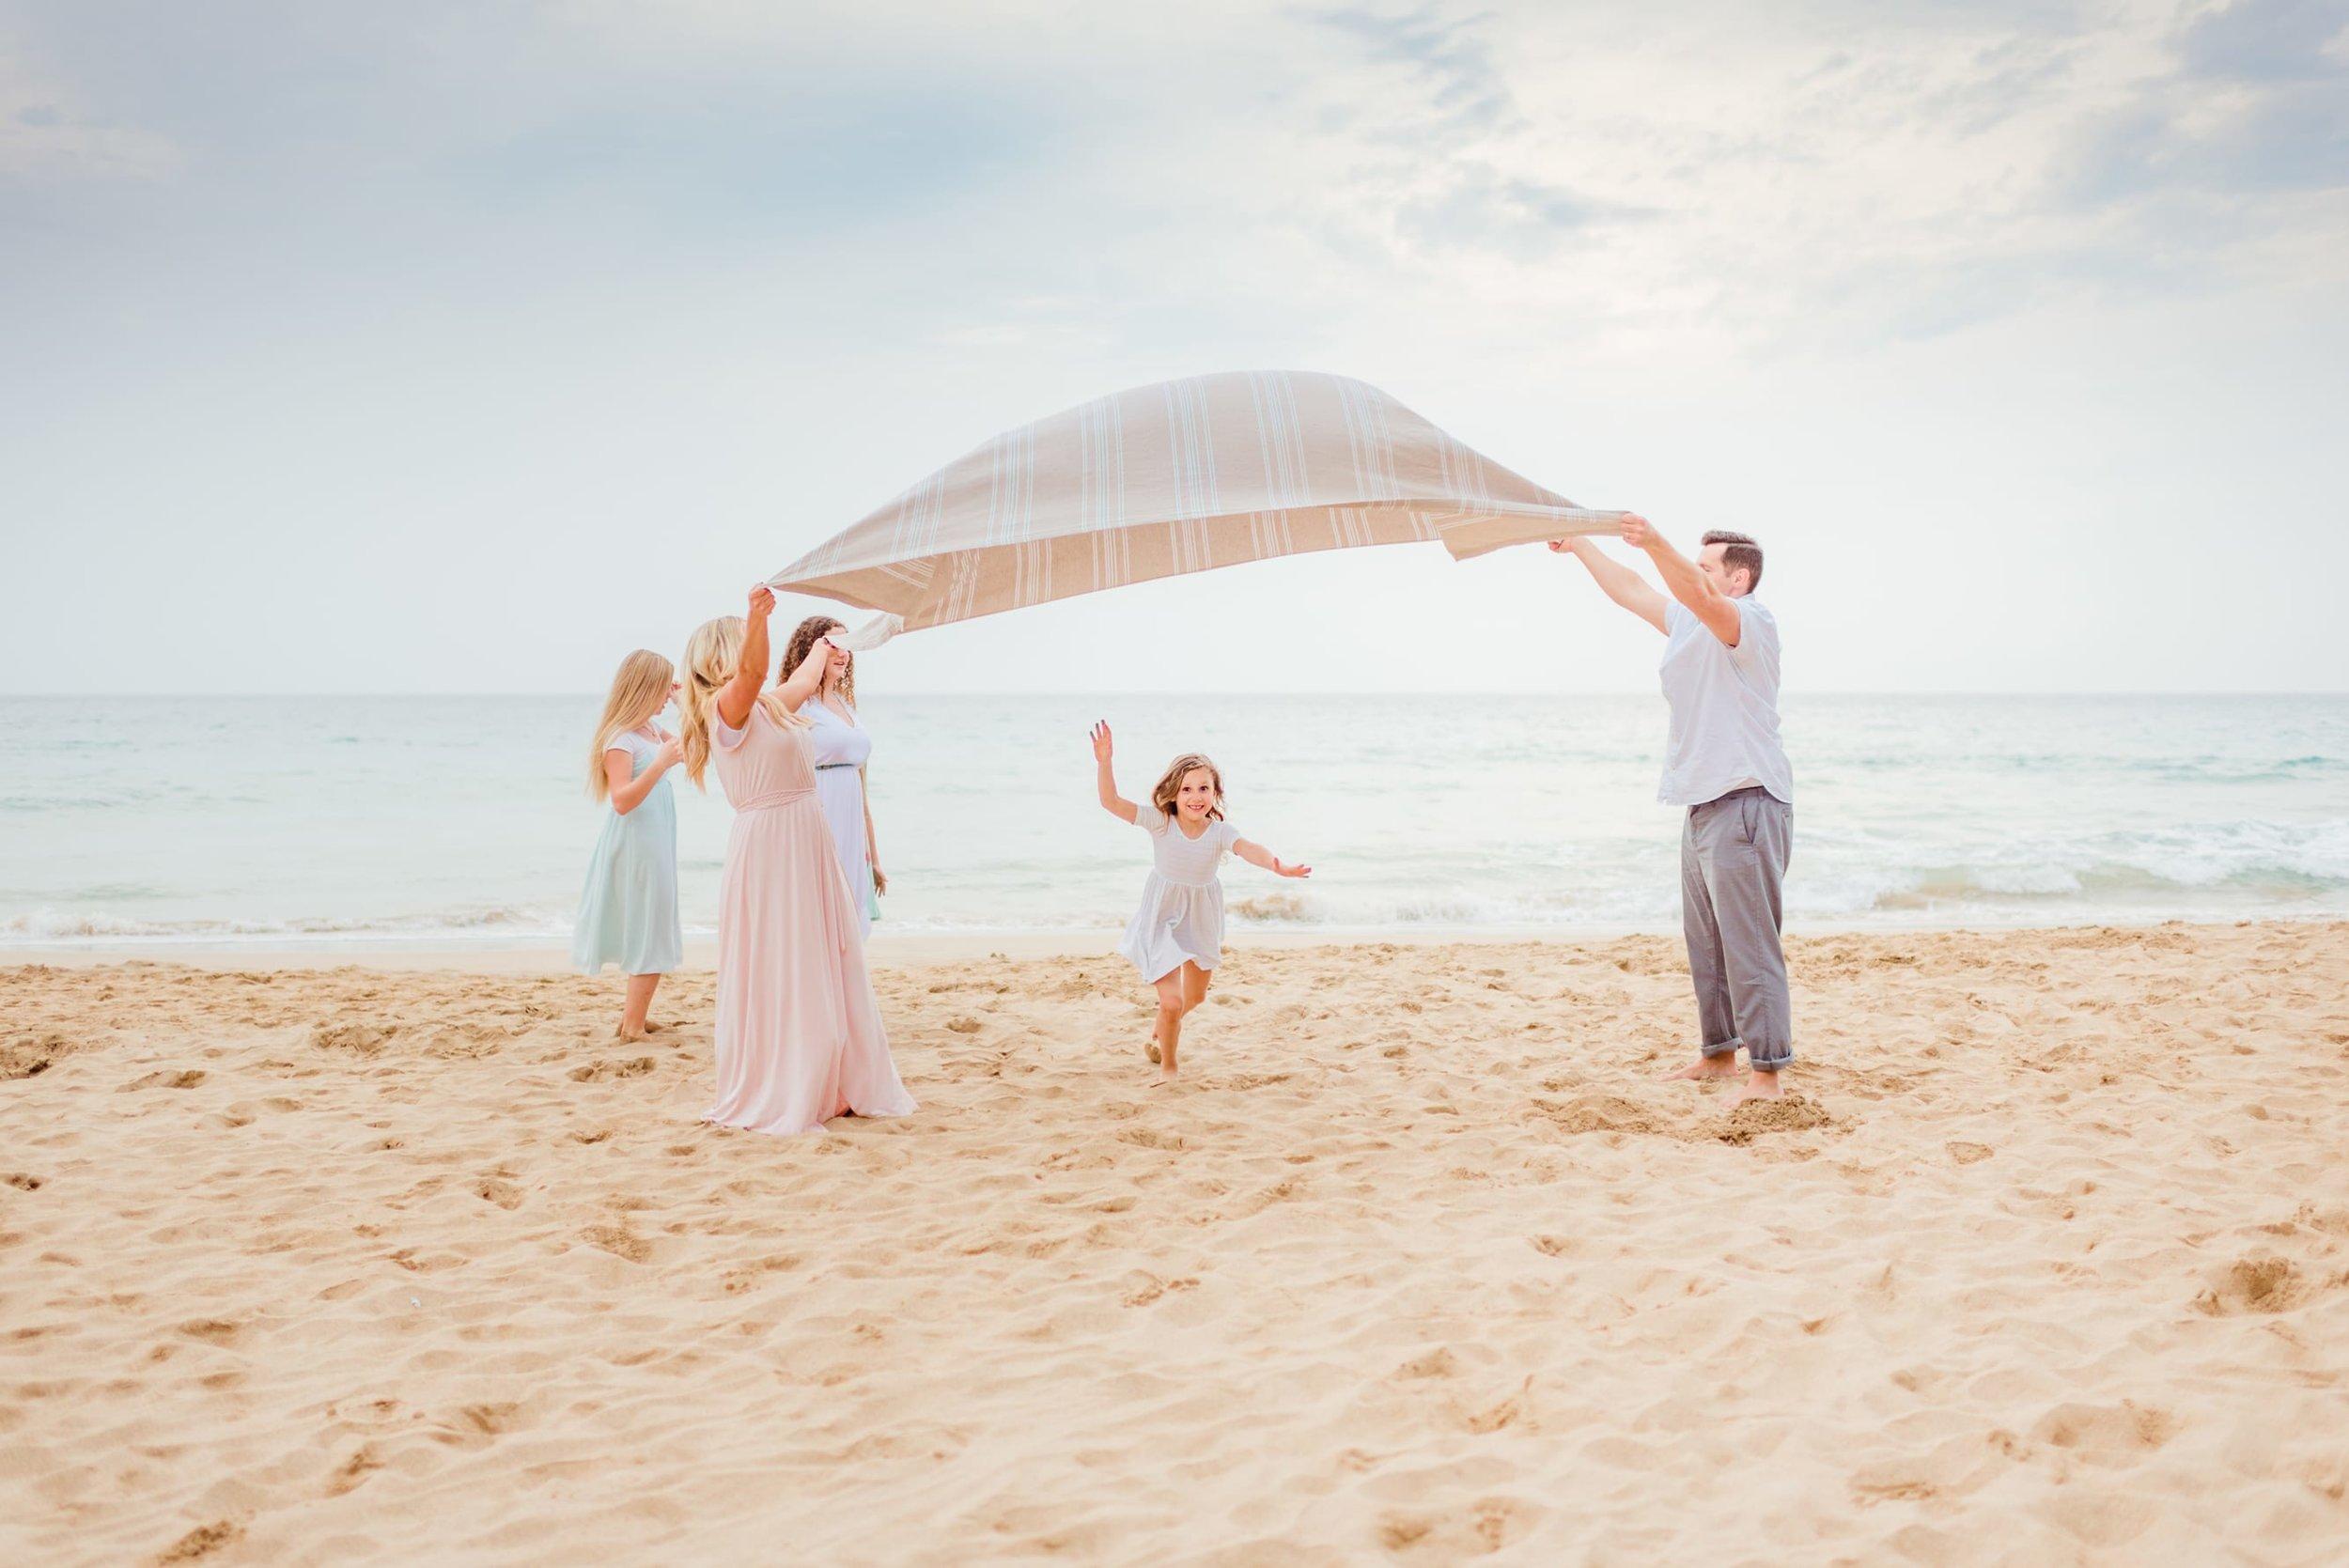 Hapuna-Beach-Resort-Hawaii-Family-Photographer-11.jpg